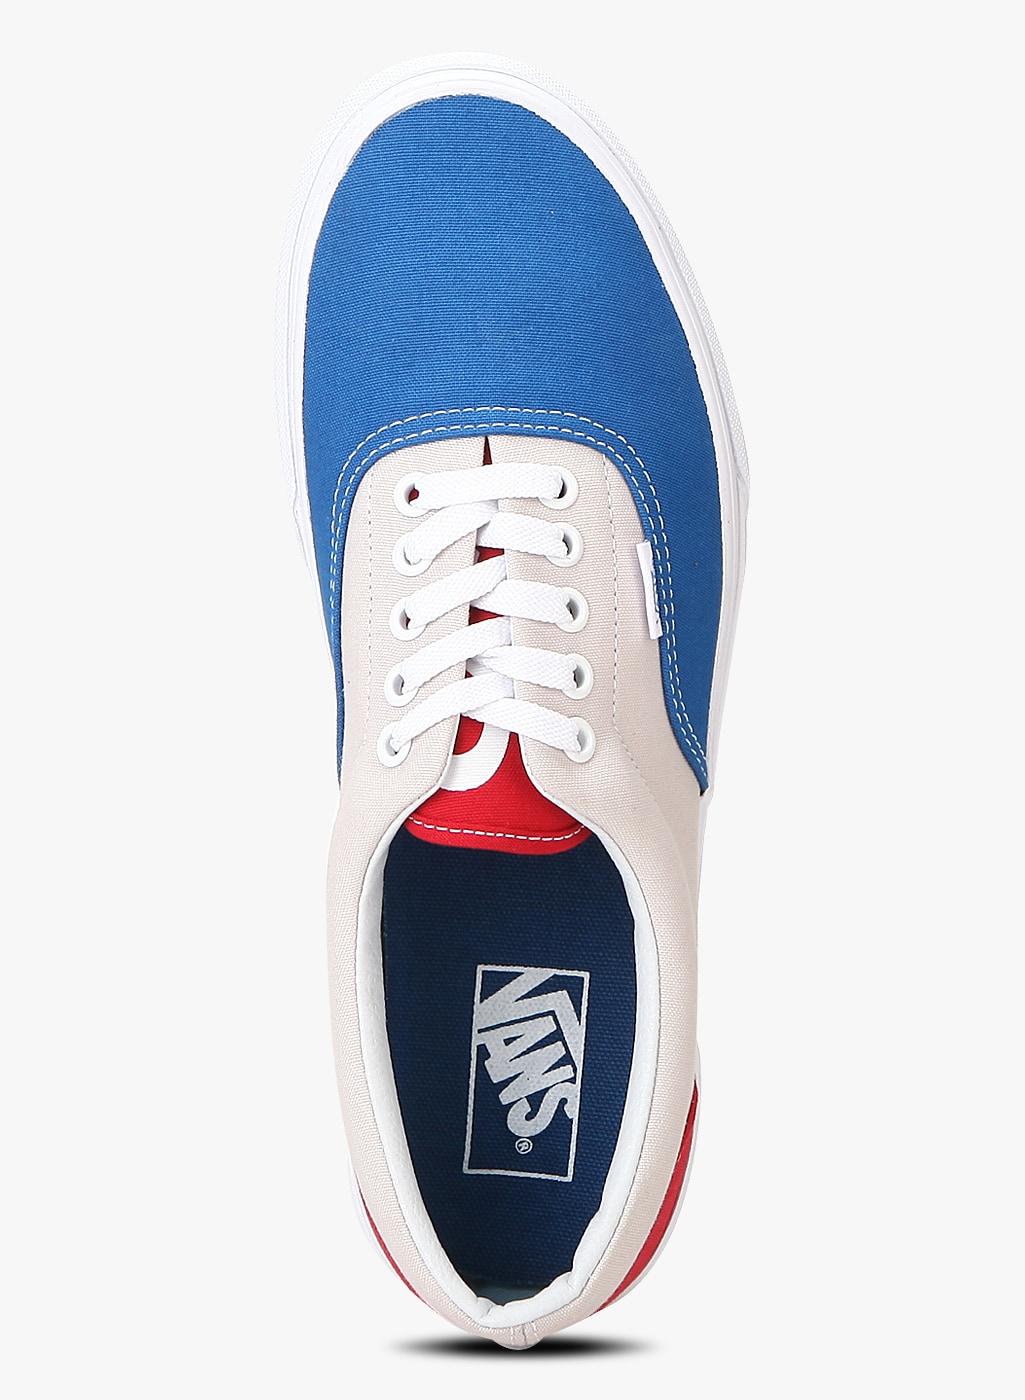 40b49616b825e Women Vans Jabong Sneakers India Buy Online In TkPZXiuwO